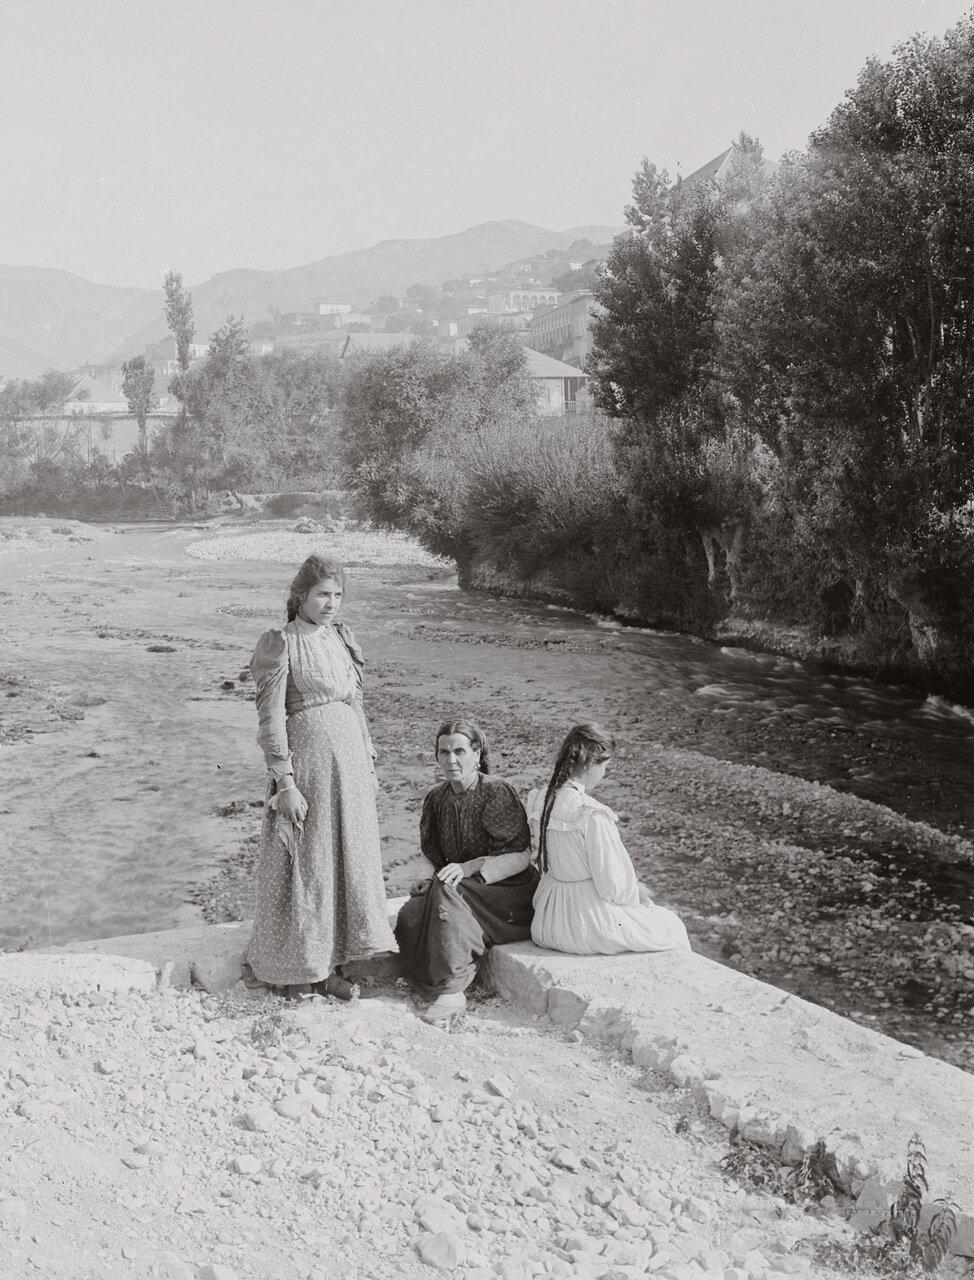 Река Бердауни. Захле, Ливан. 1900-1920 гг.